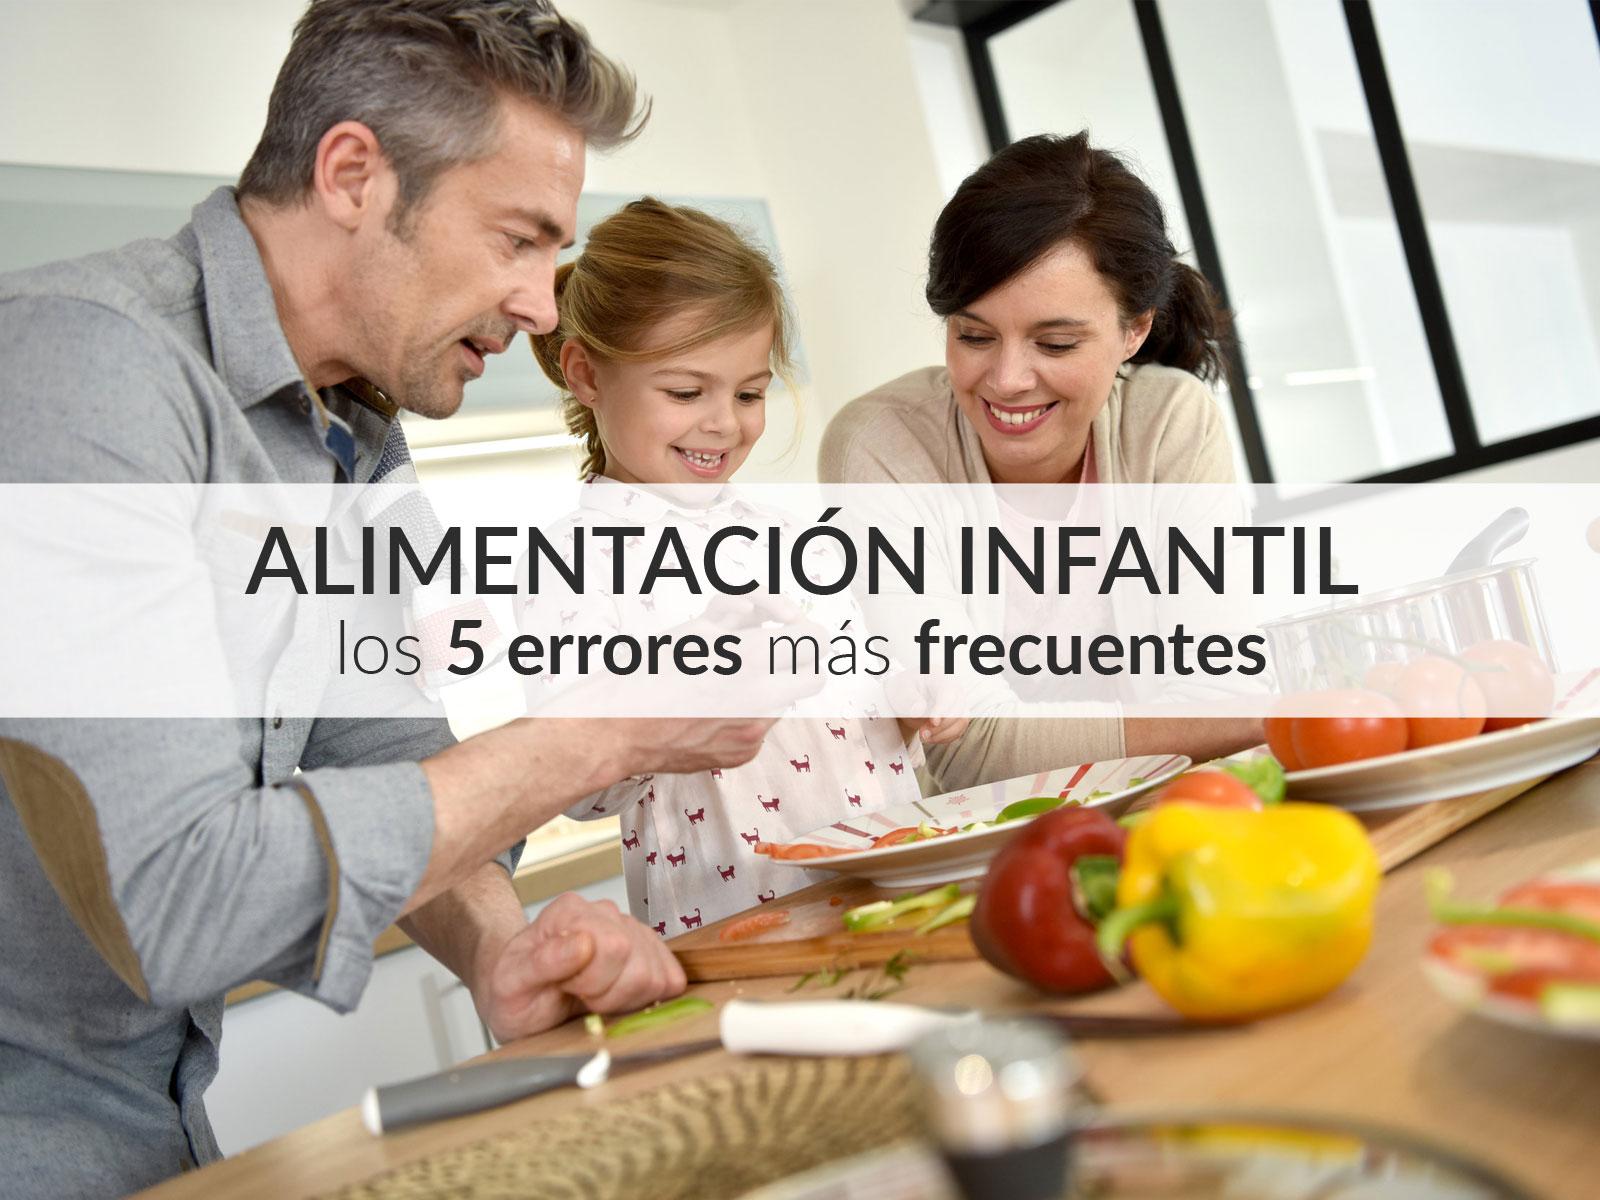 5-errores-mas-frecuentes-en-la-alimentacion-infantil